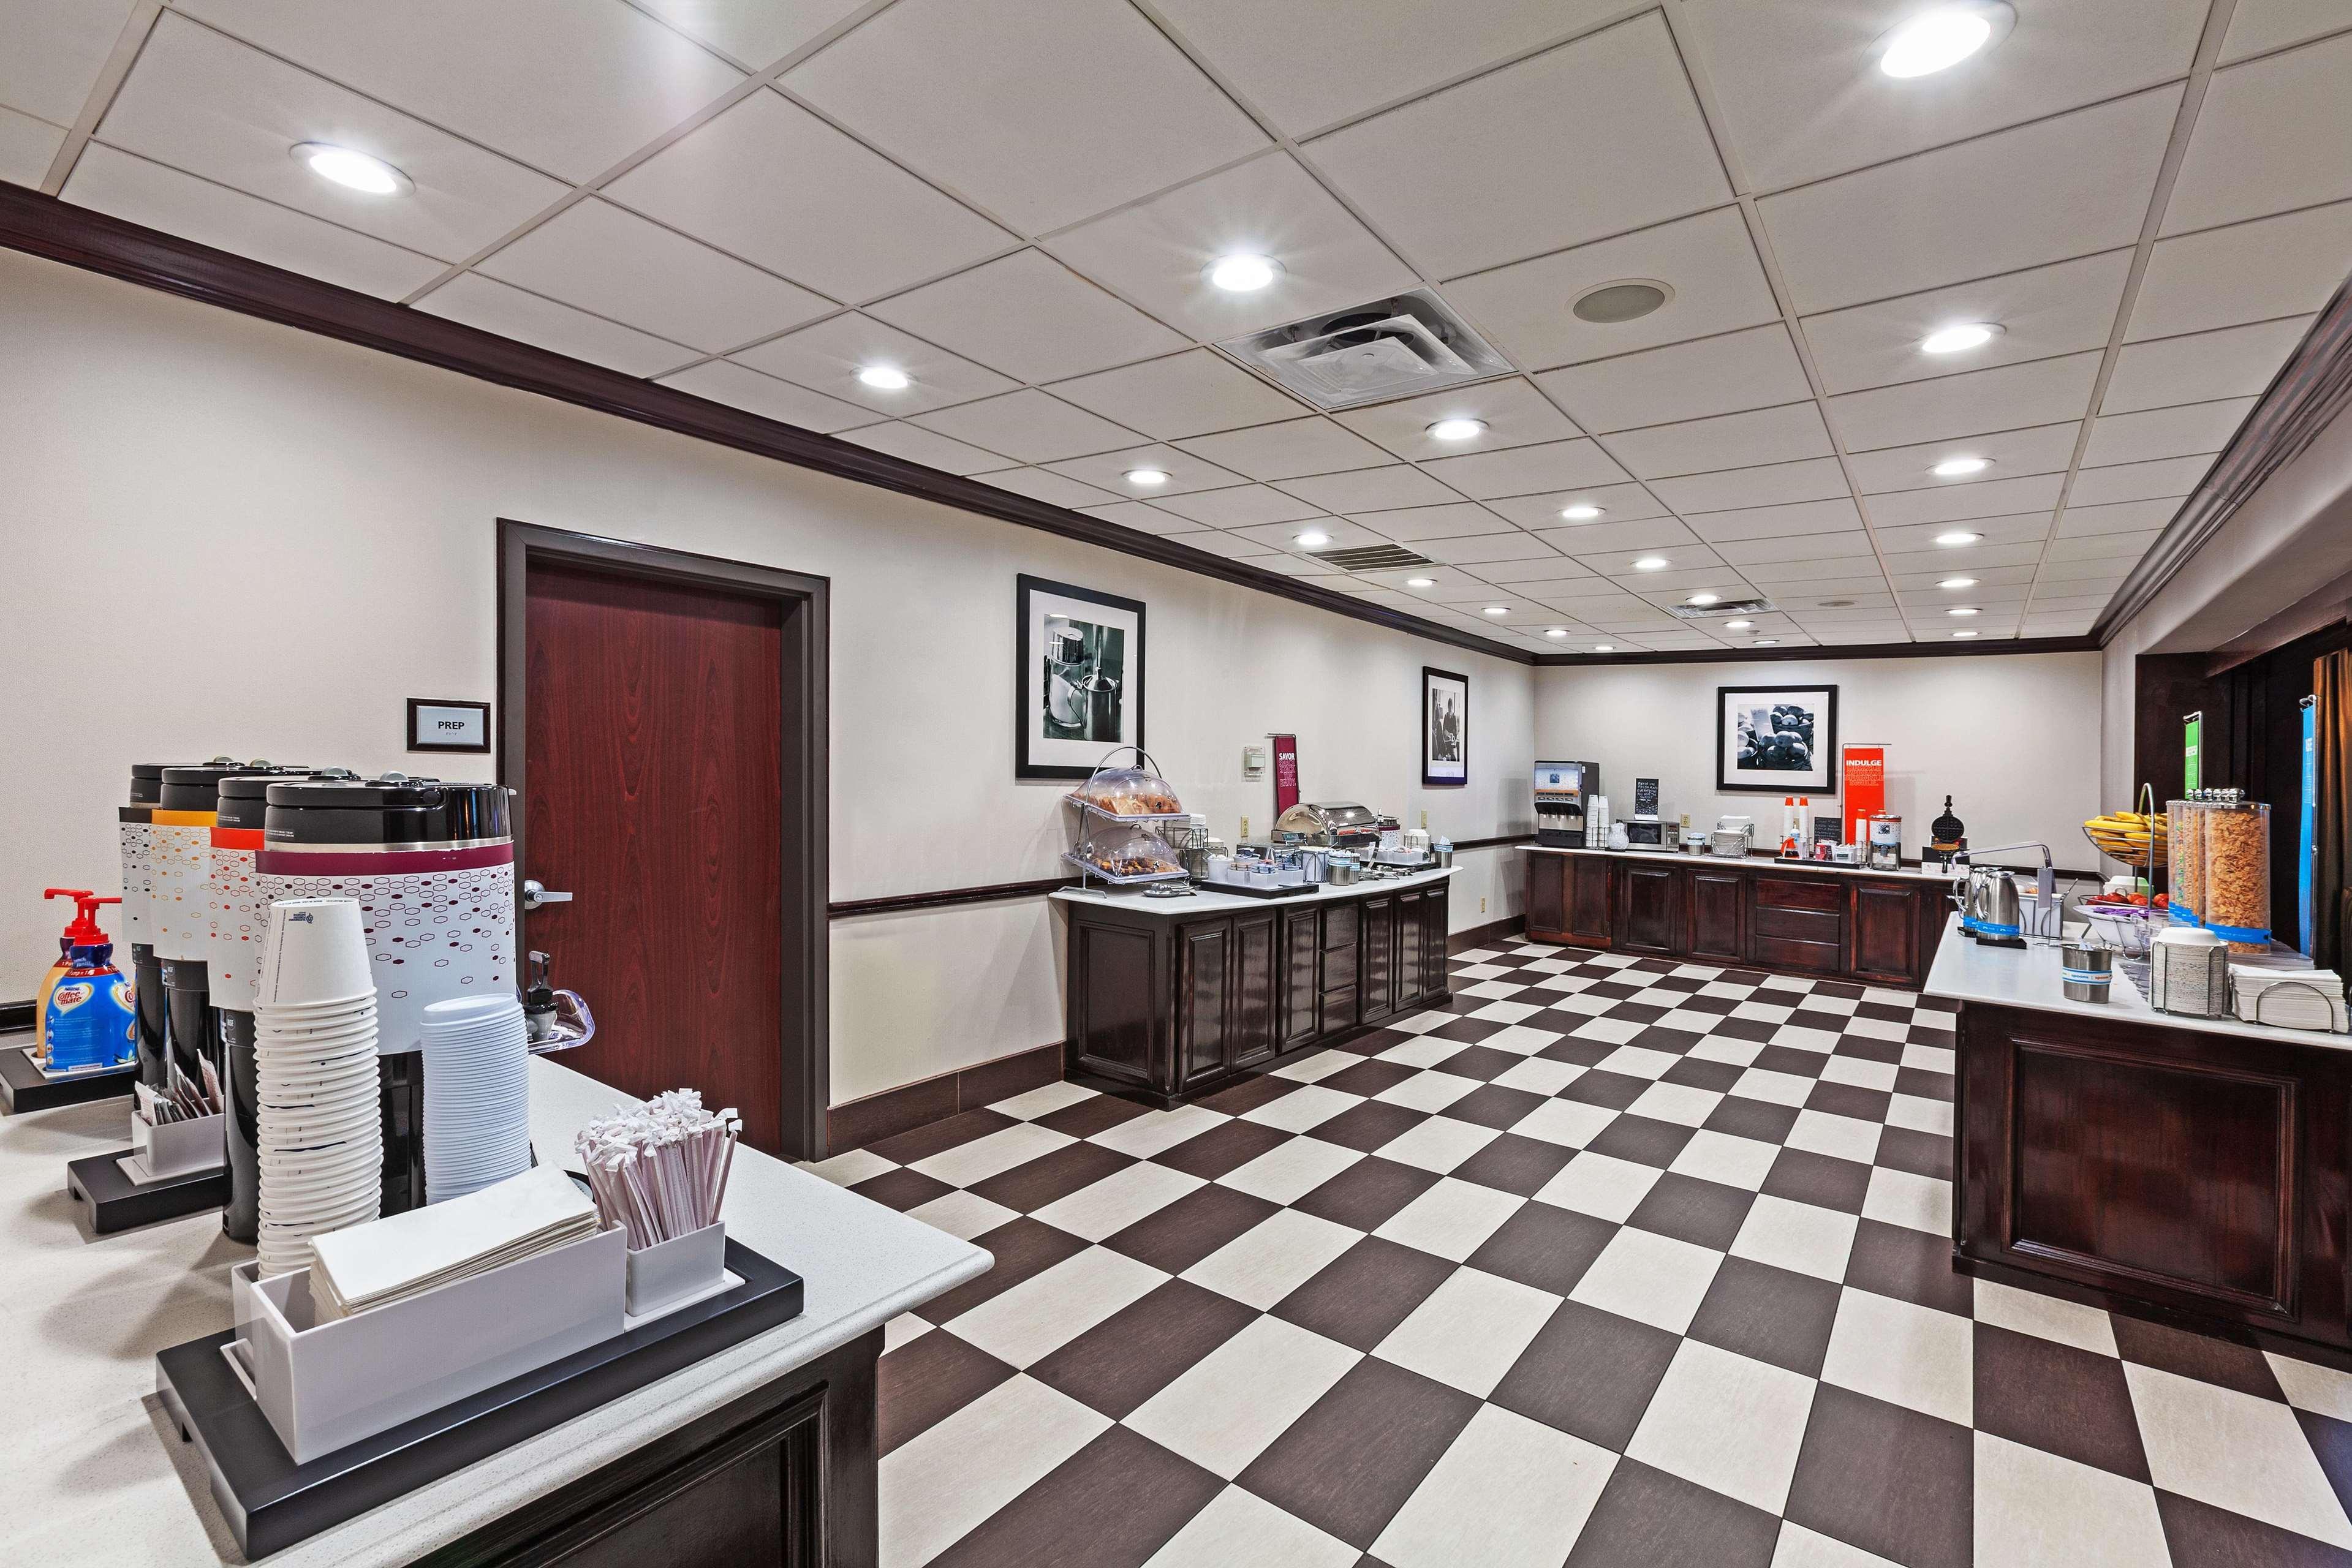 Hampton Inn & Suites Galveston image 15